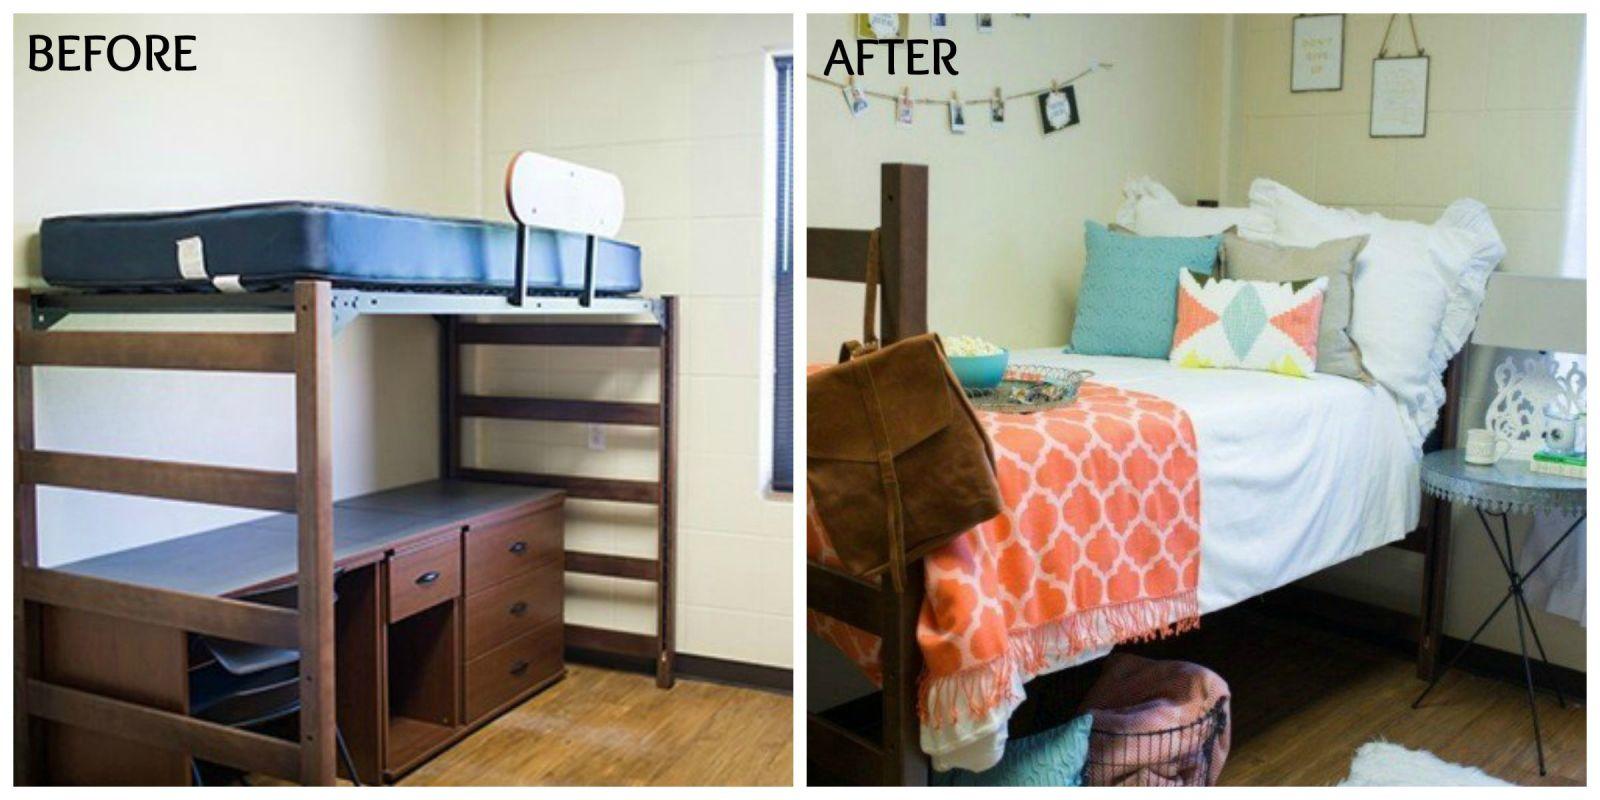 Dorm Living Room Decorating Ideas - Zion Star